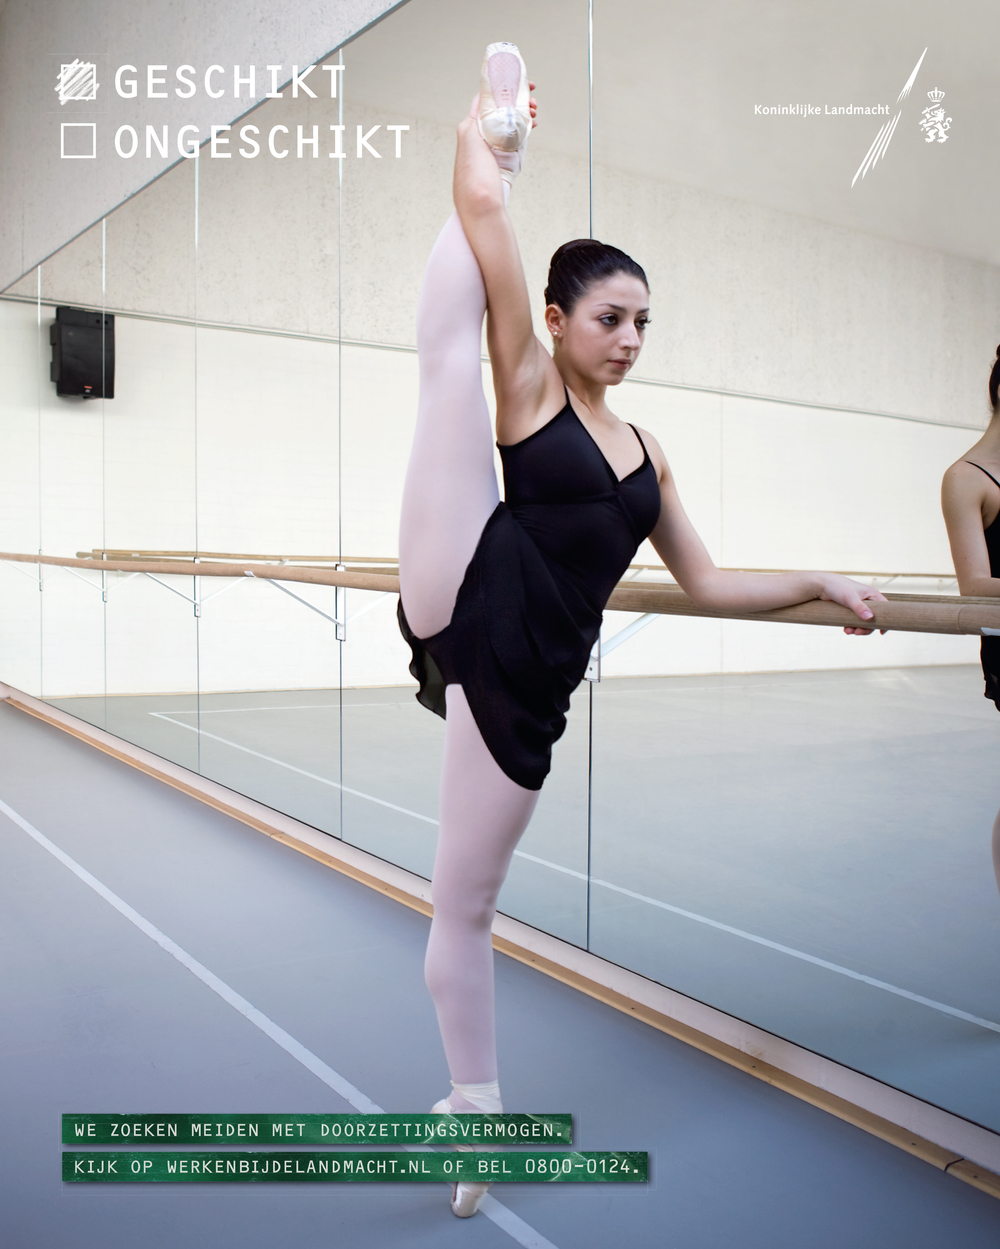 Landmacht_Ballerina.jpg